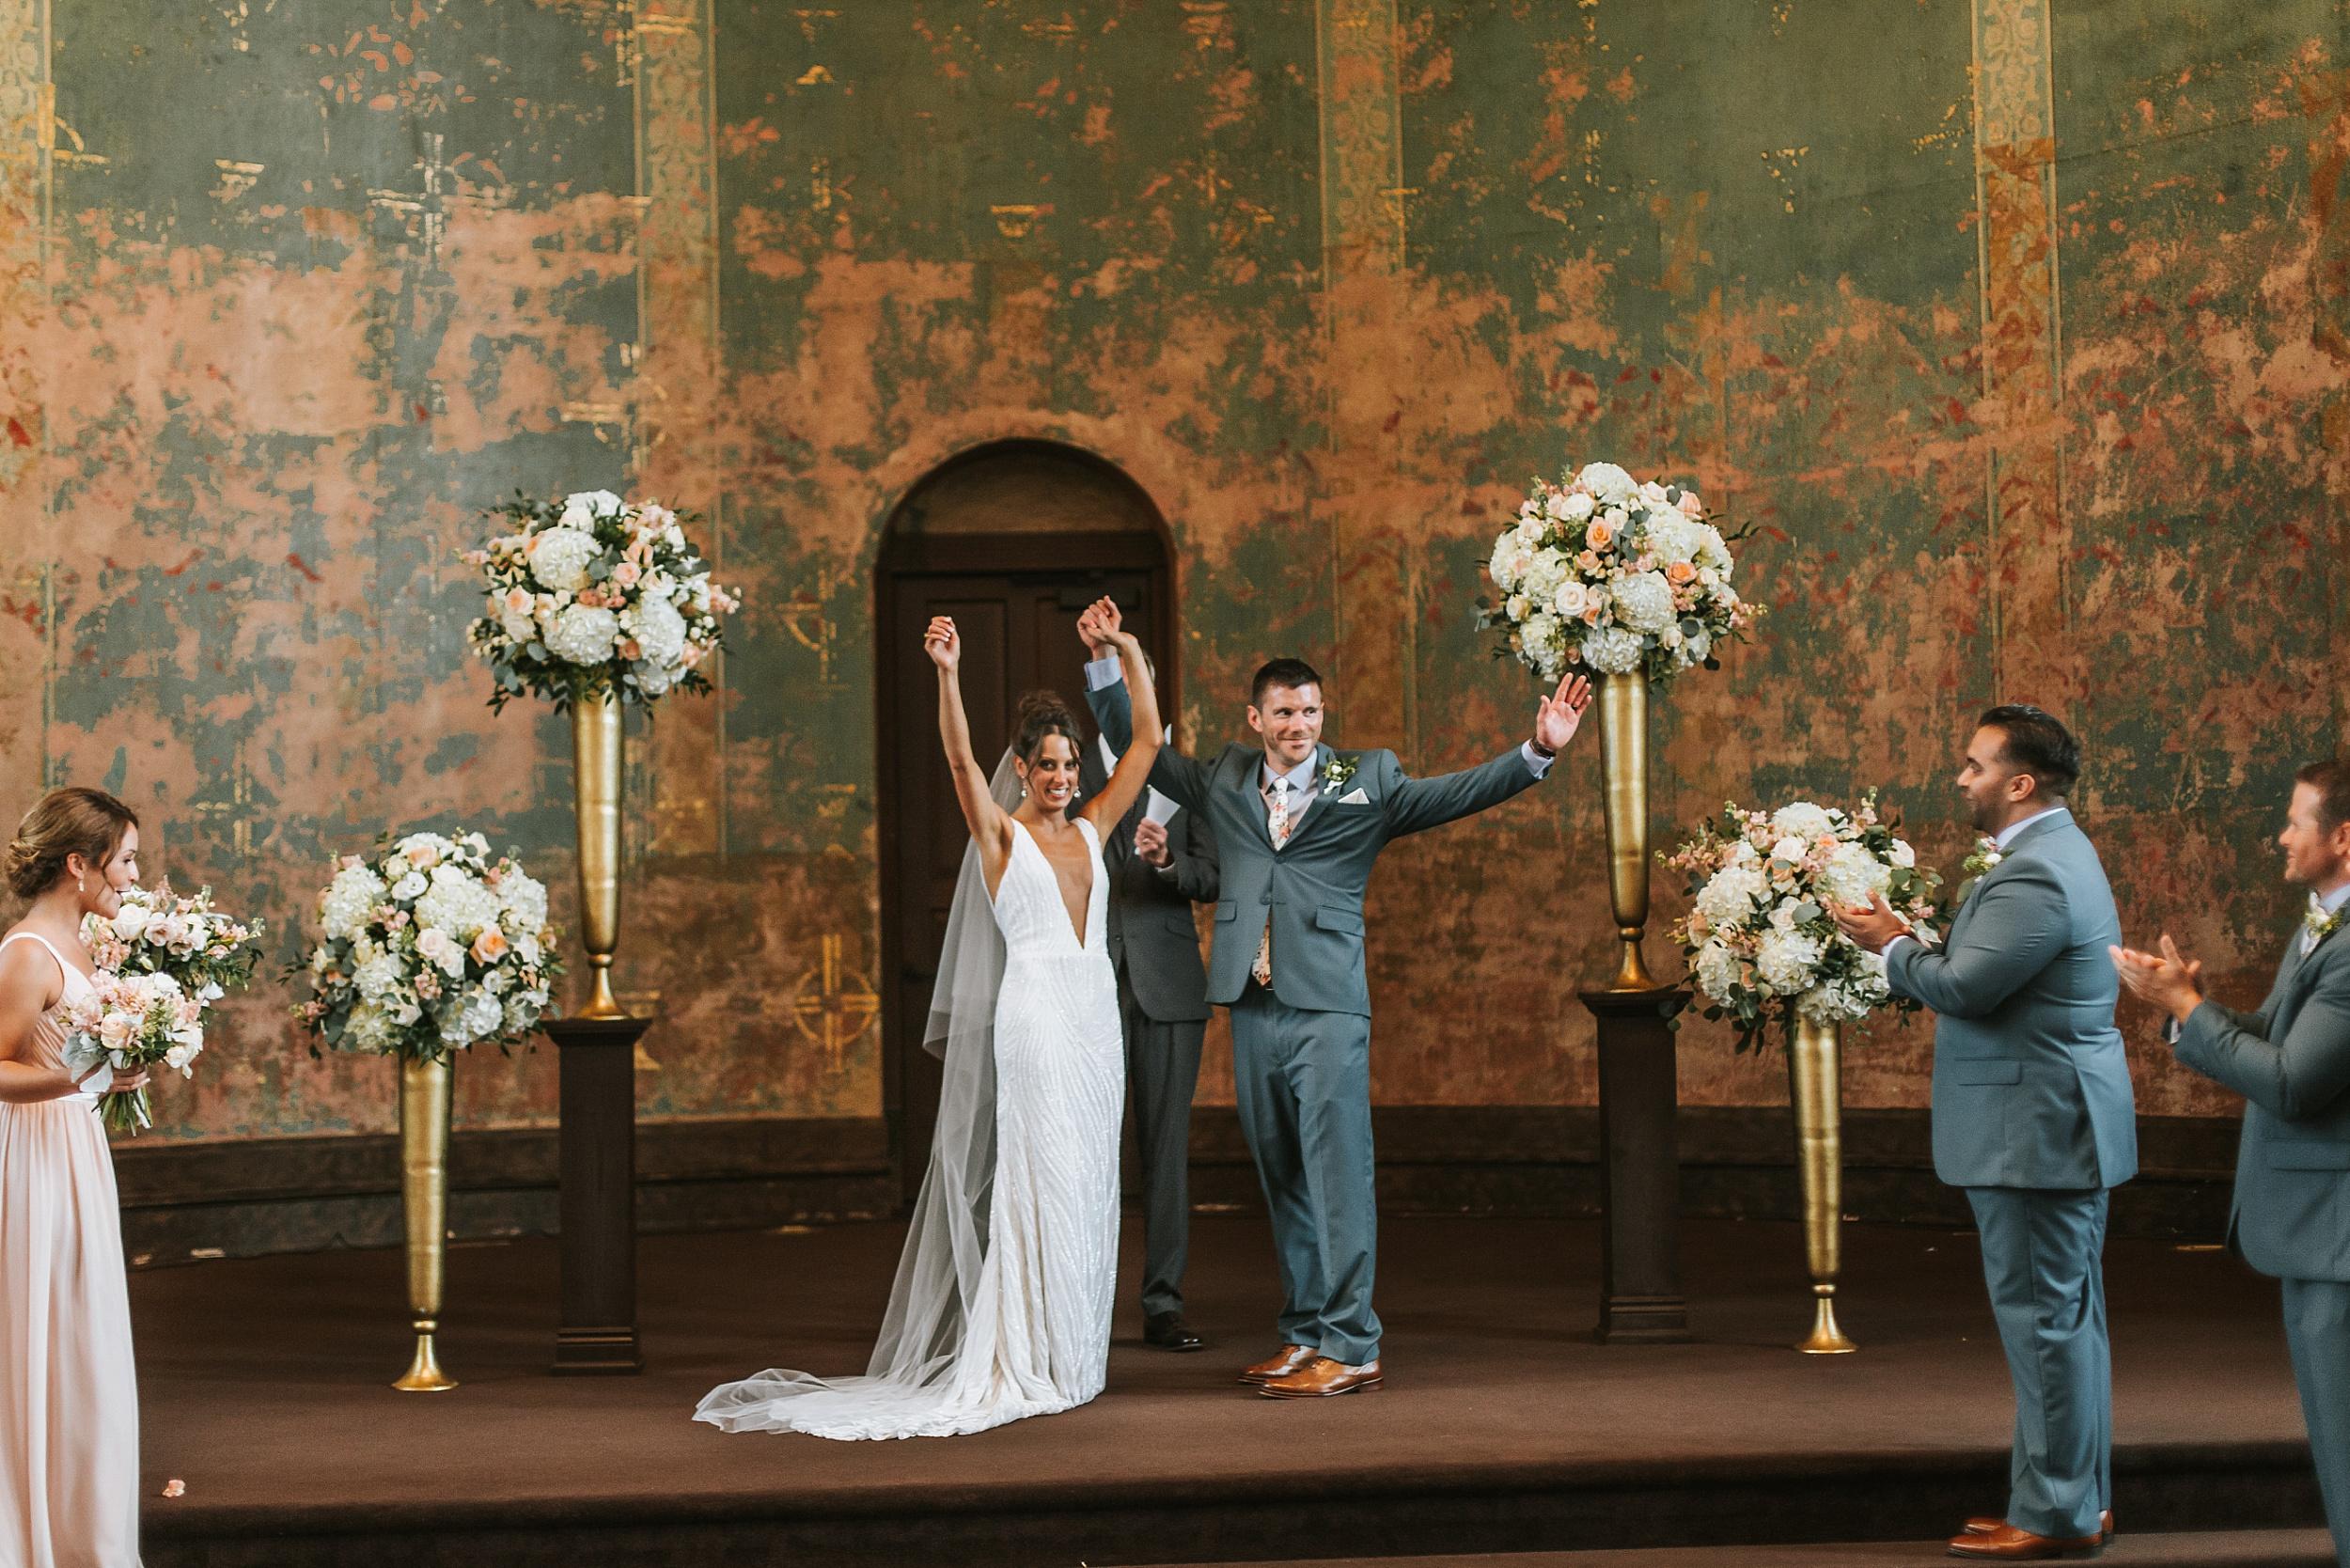 Brooke Townsend Photography - Cincinnati Wedding Photographer (129 of 170).jpg